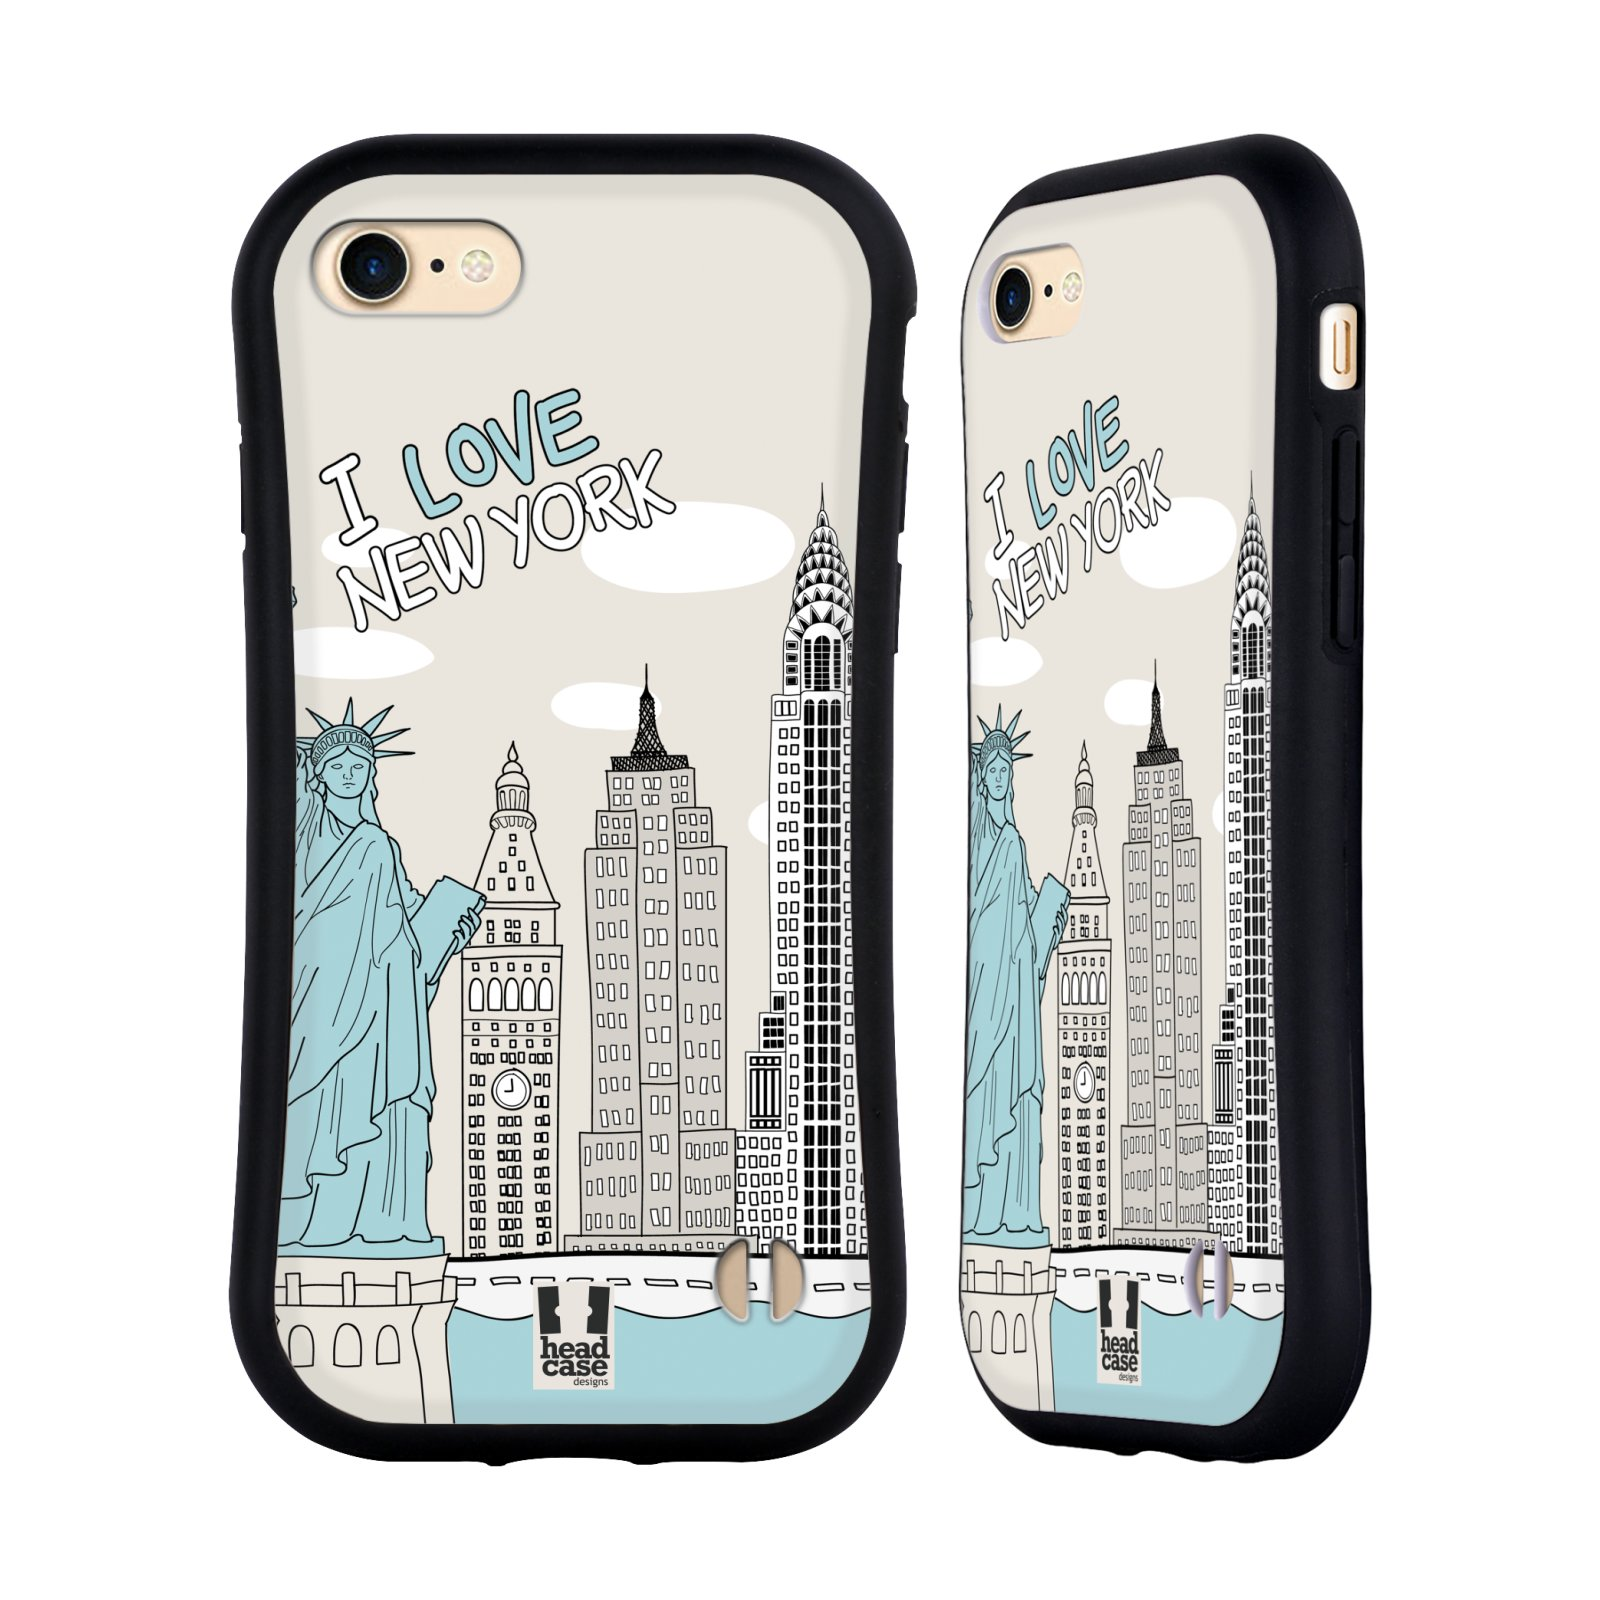 HEAD CASE silikon/plast odolný obal na mobil Apple Iphone 7 vzor Kreslená městečka MODRÁ, USA, New York, I LOVE NEW YORK